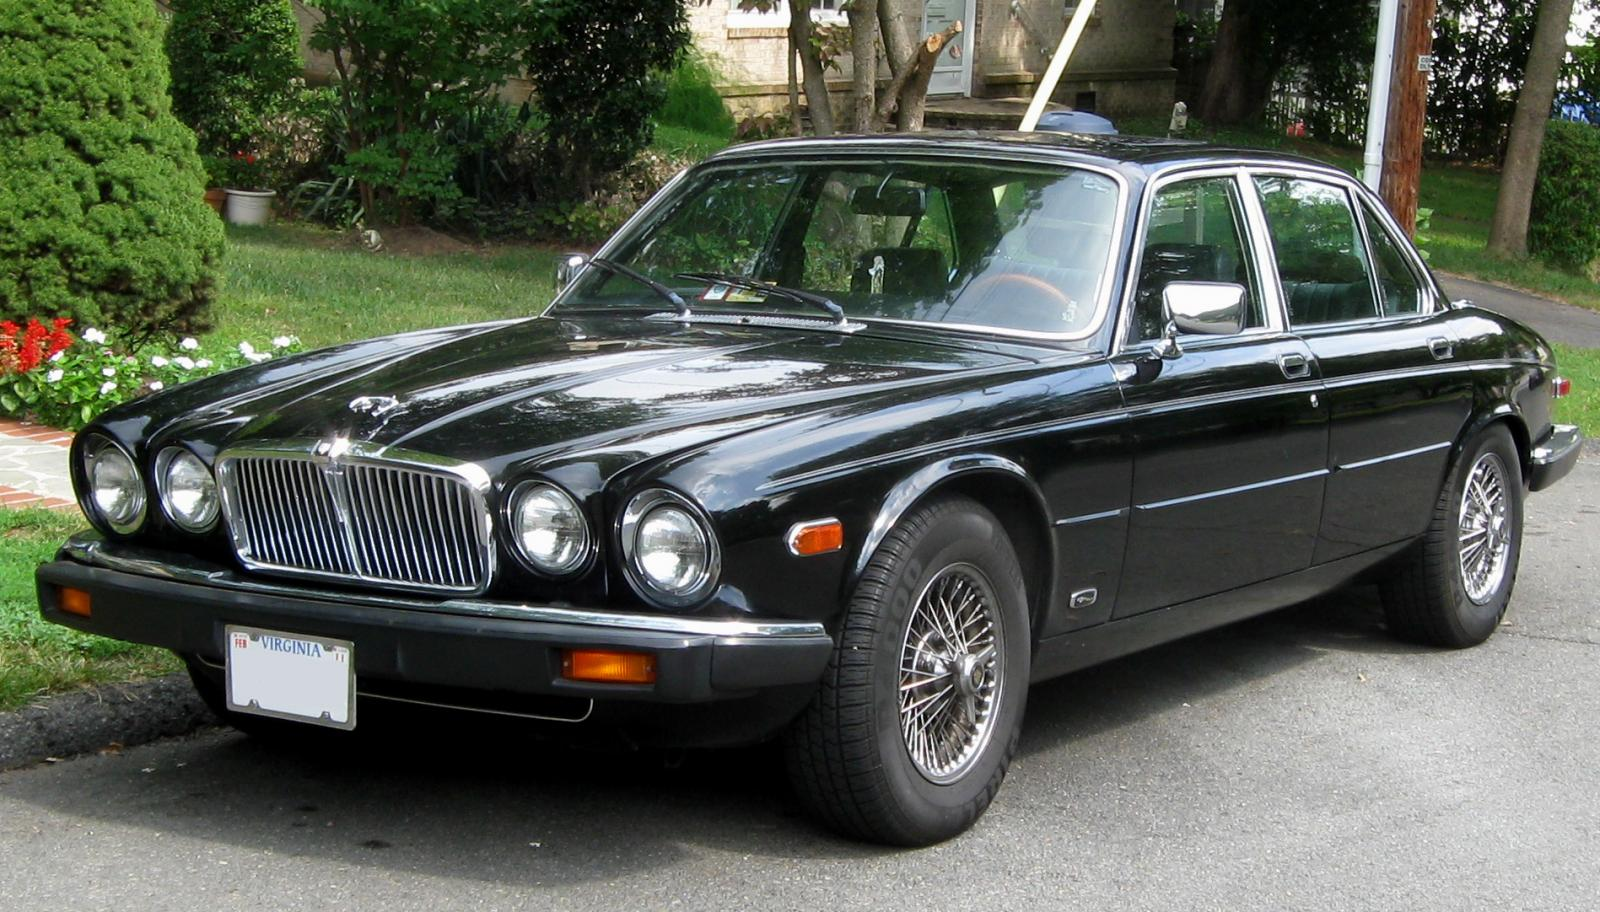 Ziemlich Jaguar Xj6 Elektrischer Schaltplan Galerie - Die Besten ...